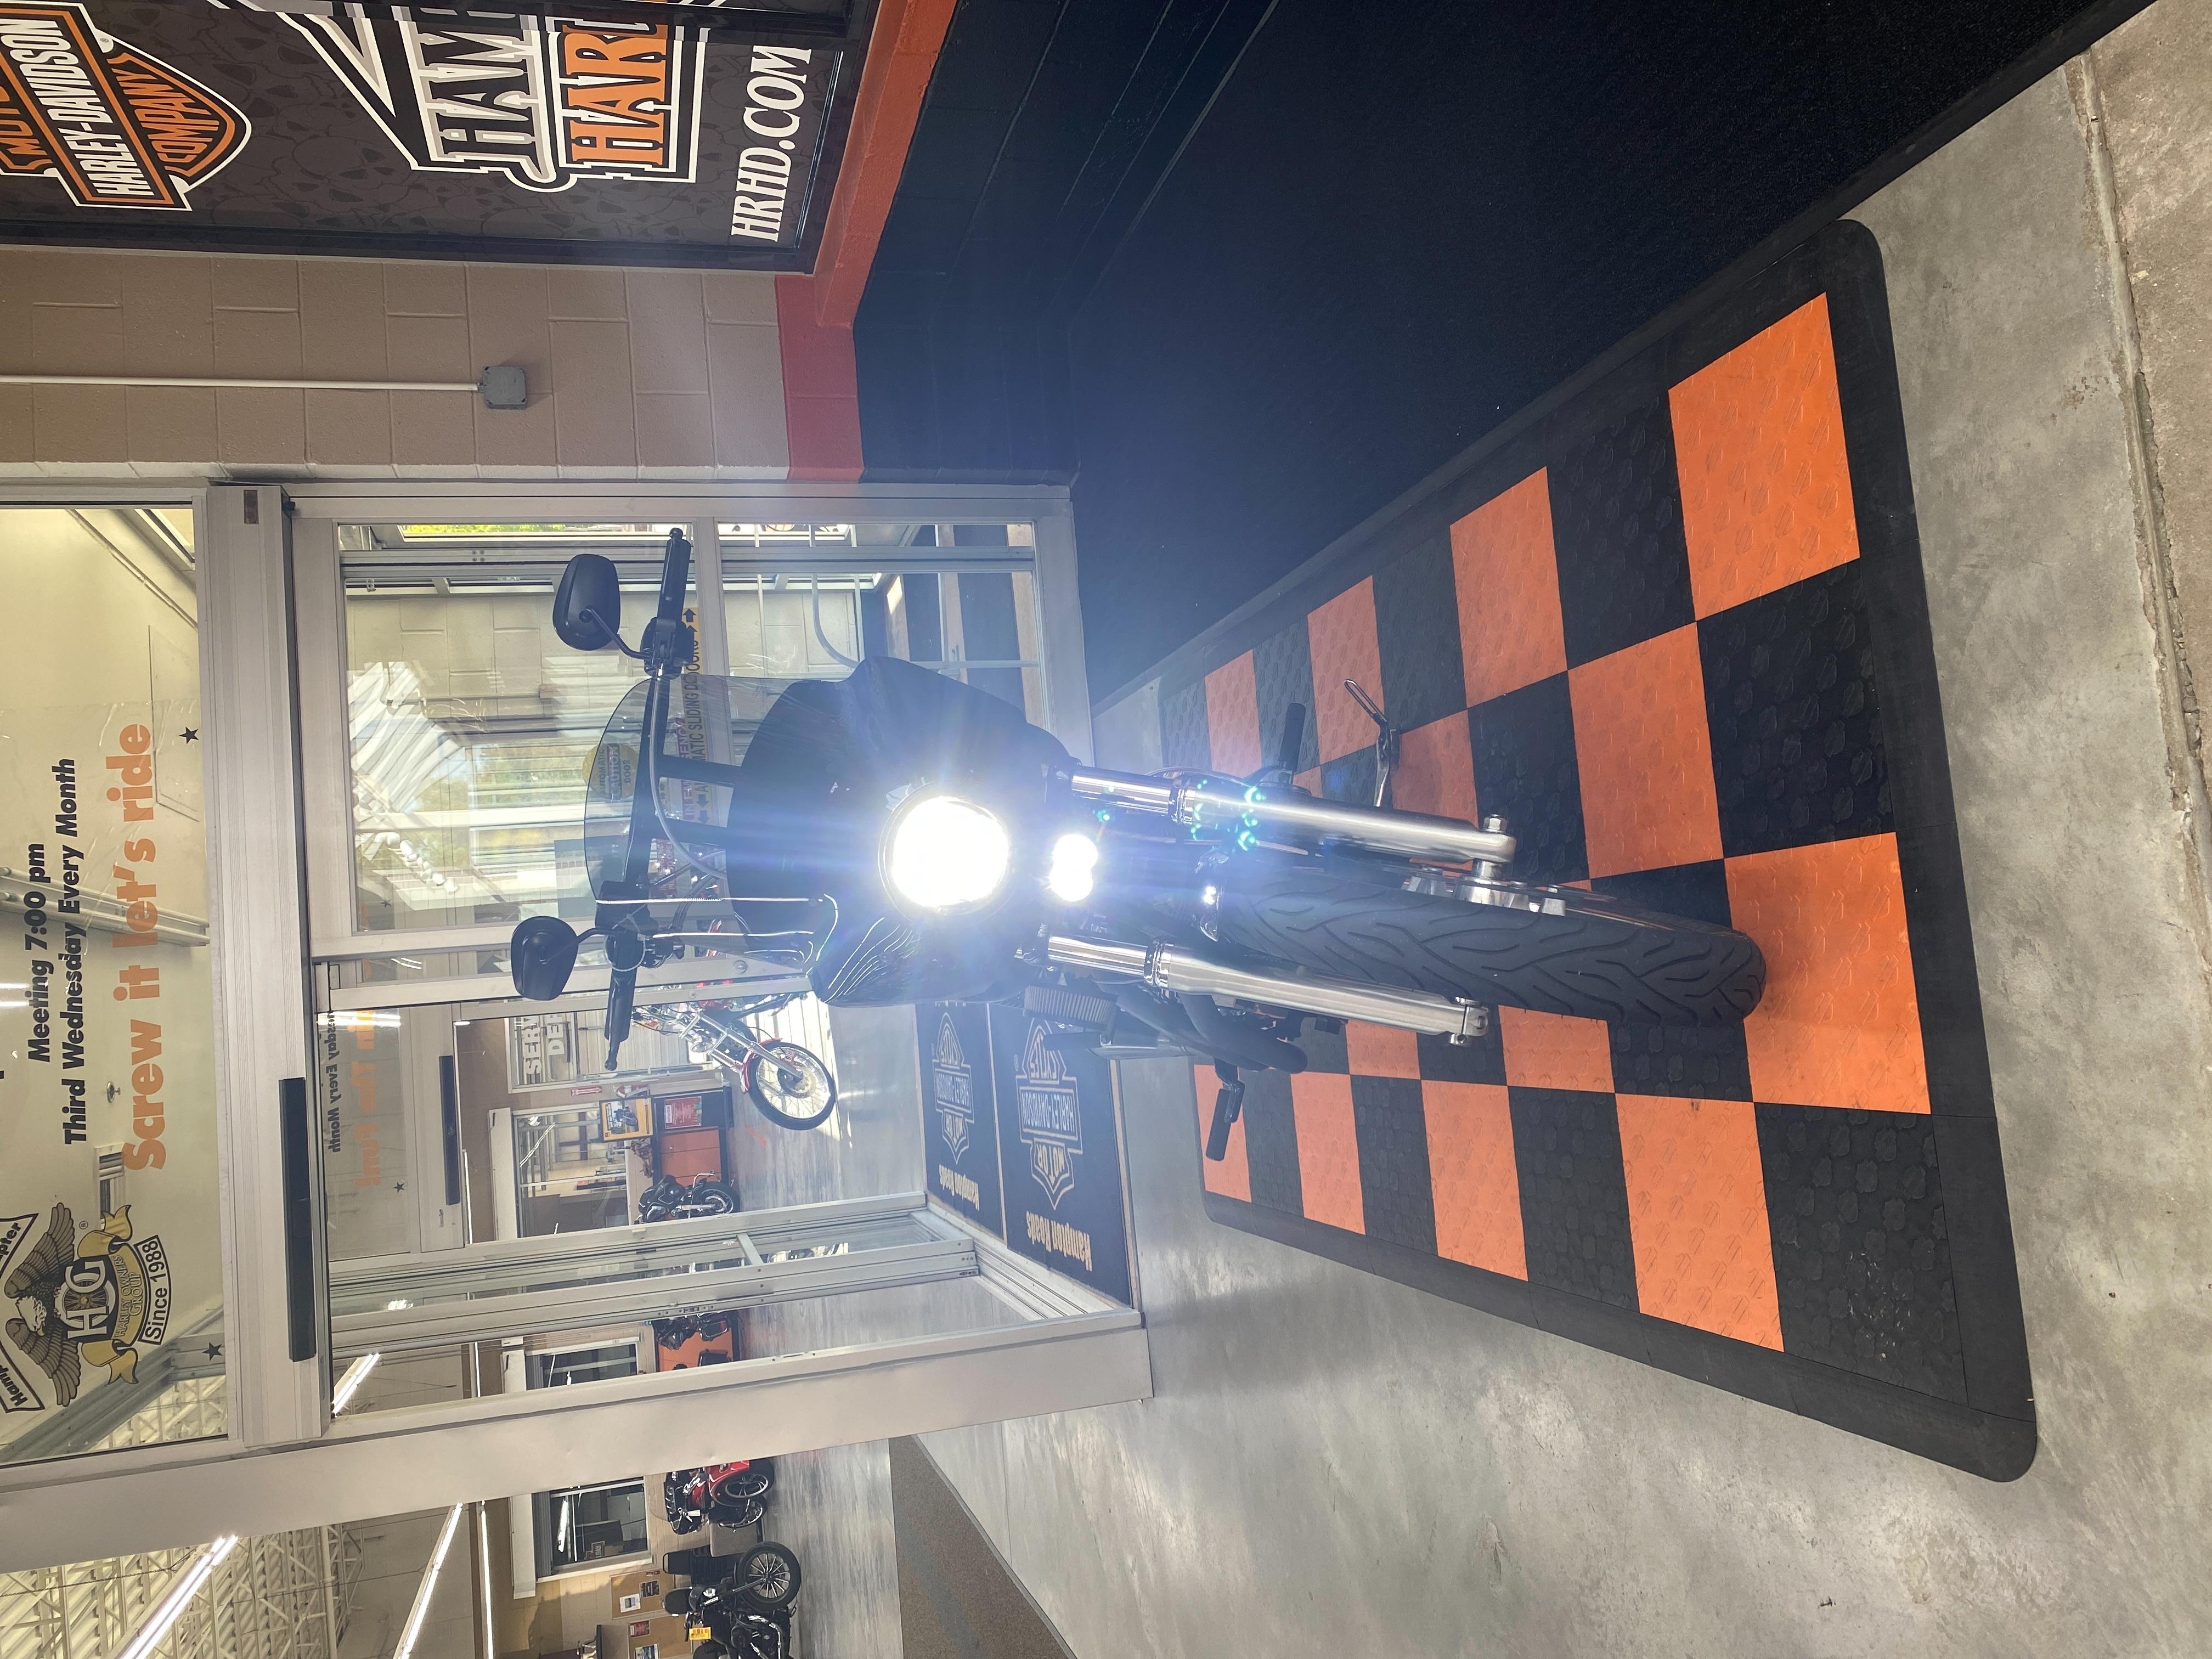 2013 Harley-Davidson Dyna Super Glide Custom at Hampton Roads Harley-Davidson